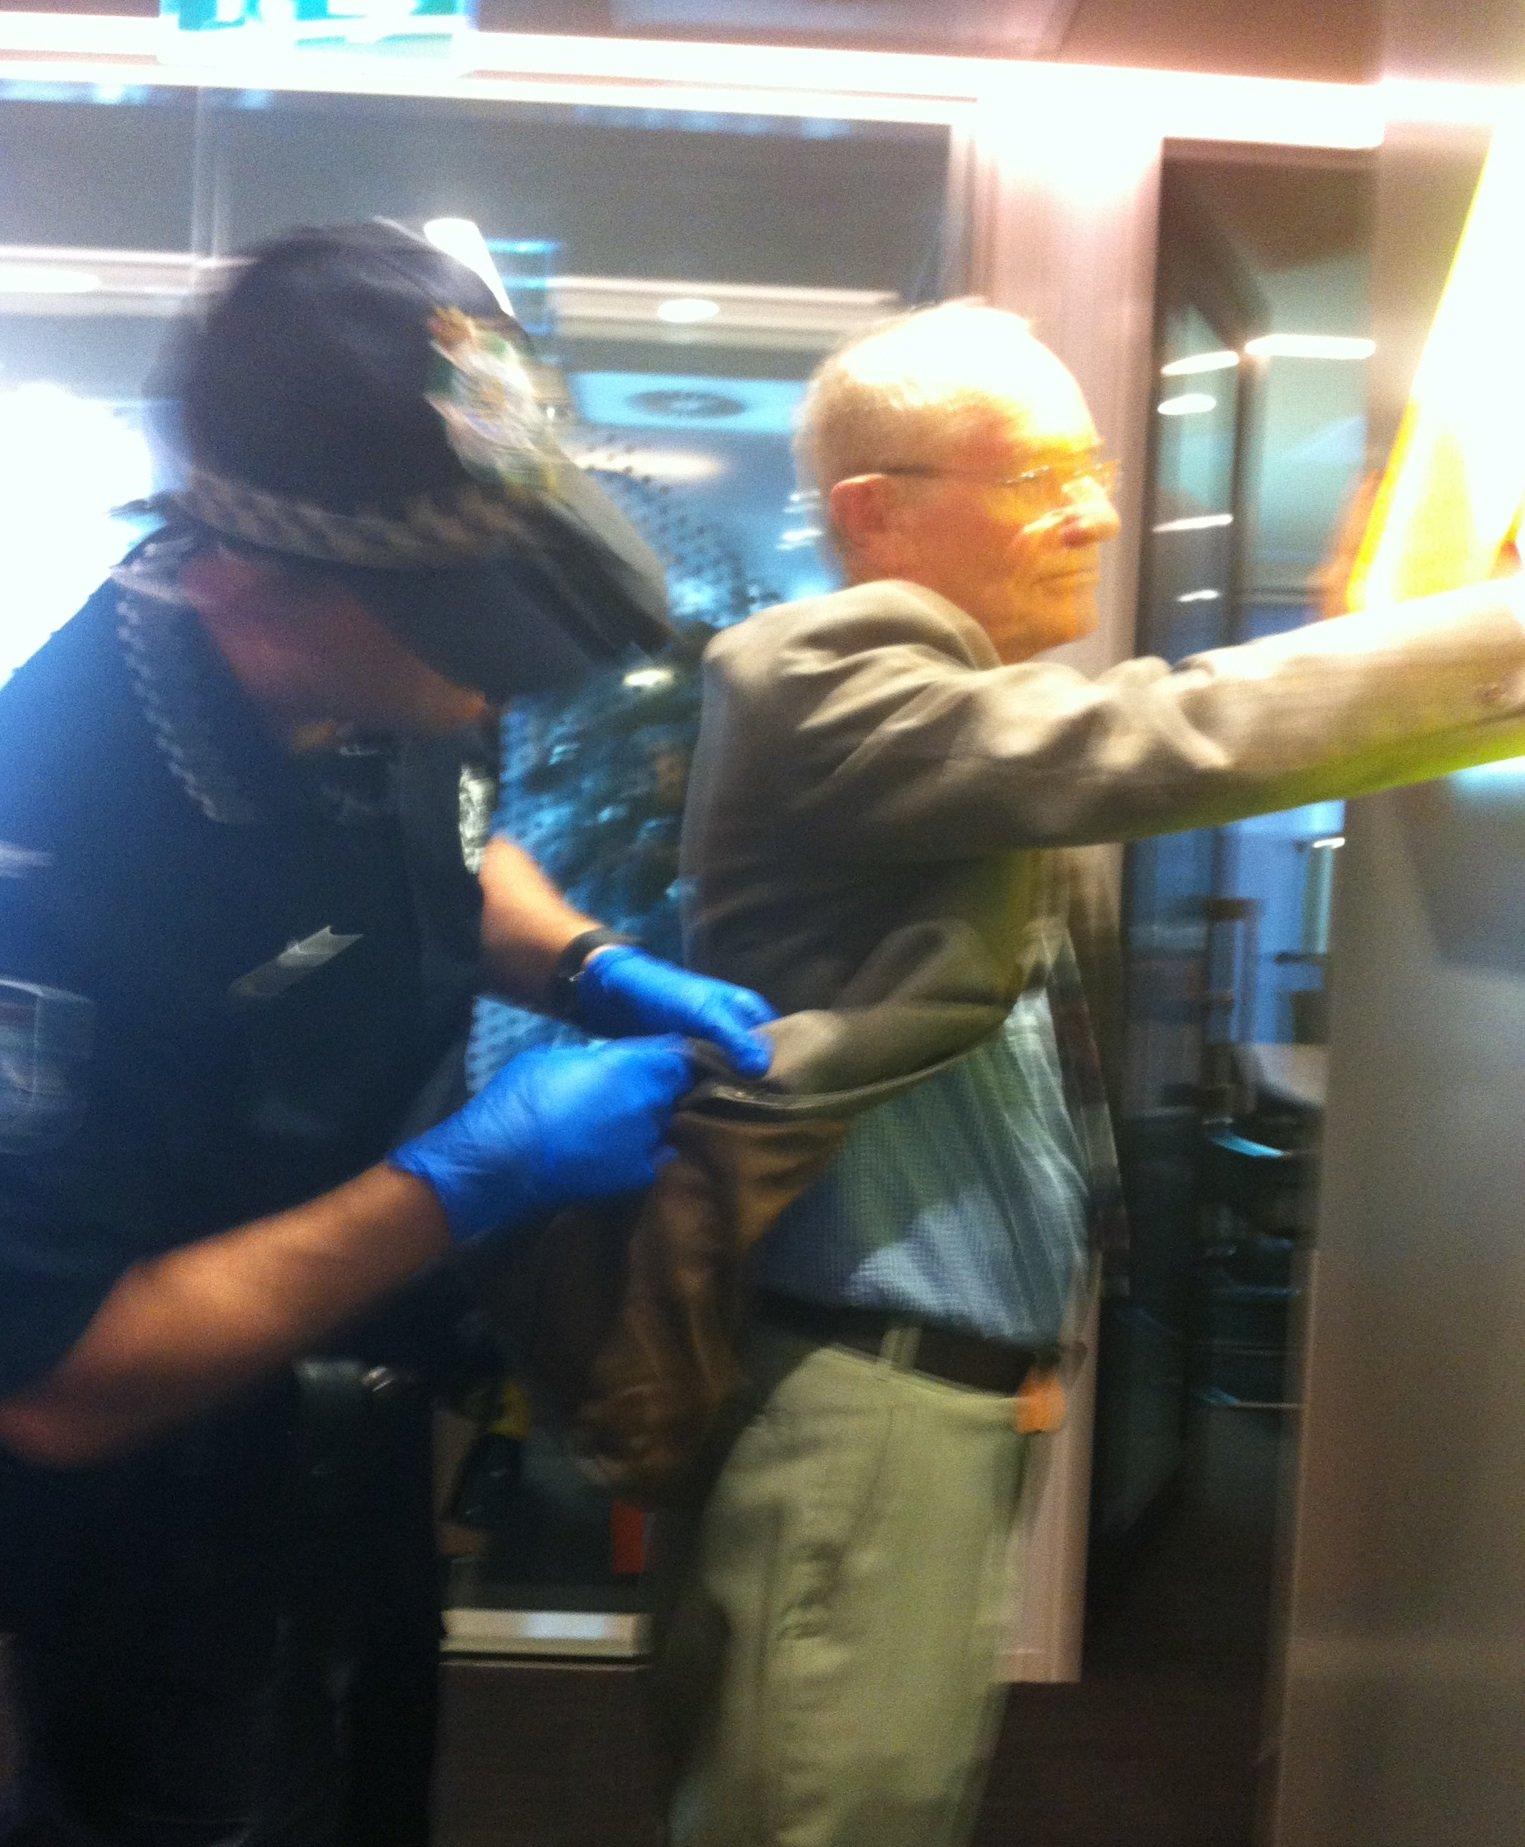 Grandparent John Sheridan arrested for occupying Aurizon HQ, demanding they withdraw $1bn+ NAIF loan application #stopadani #qldpol #auspol https://t.co/fqqslDJg5X